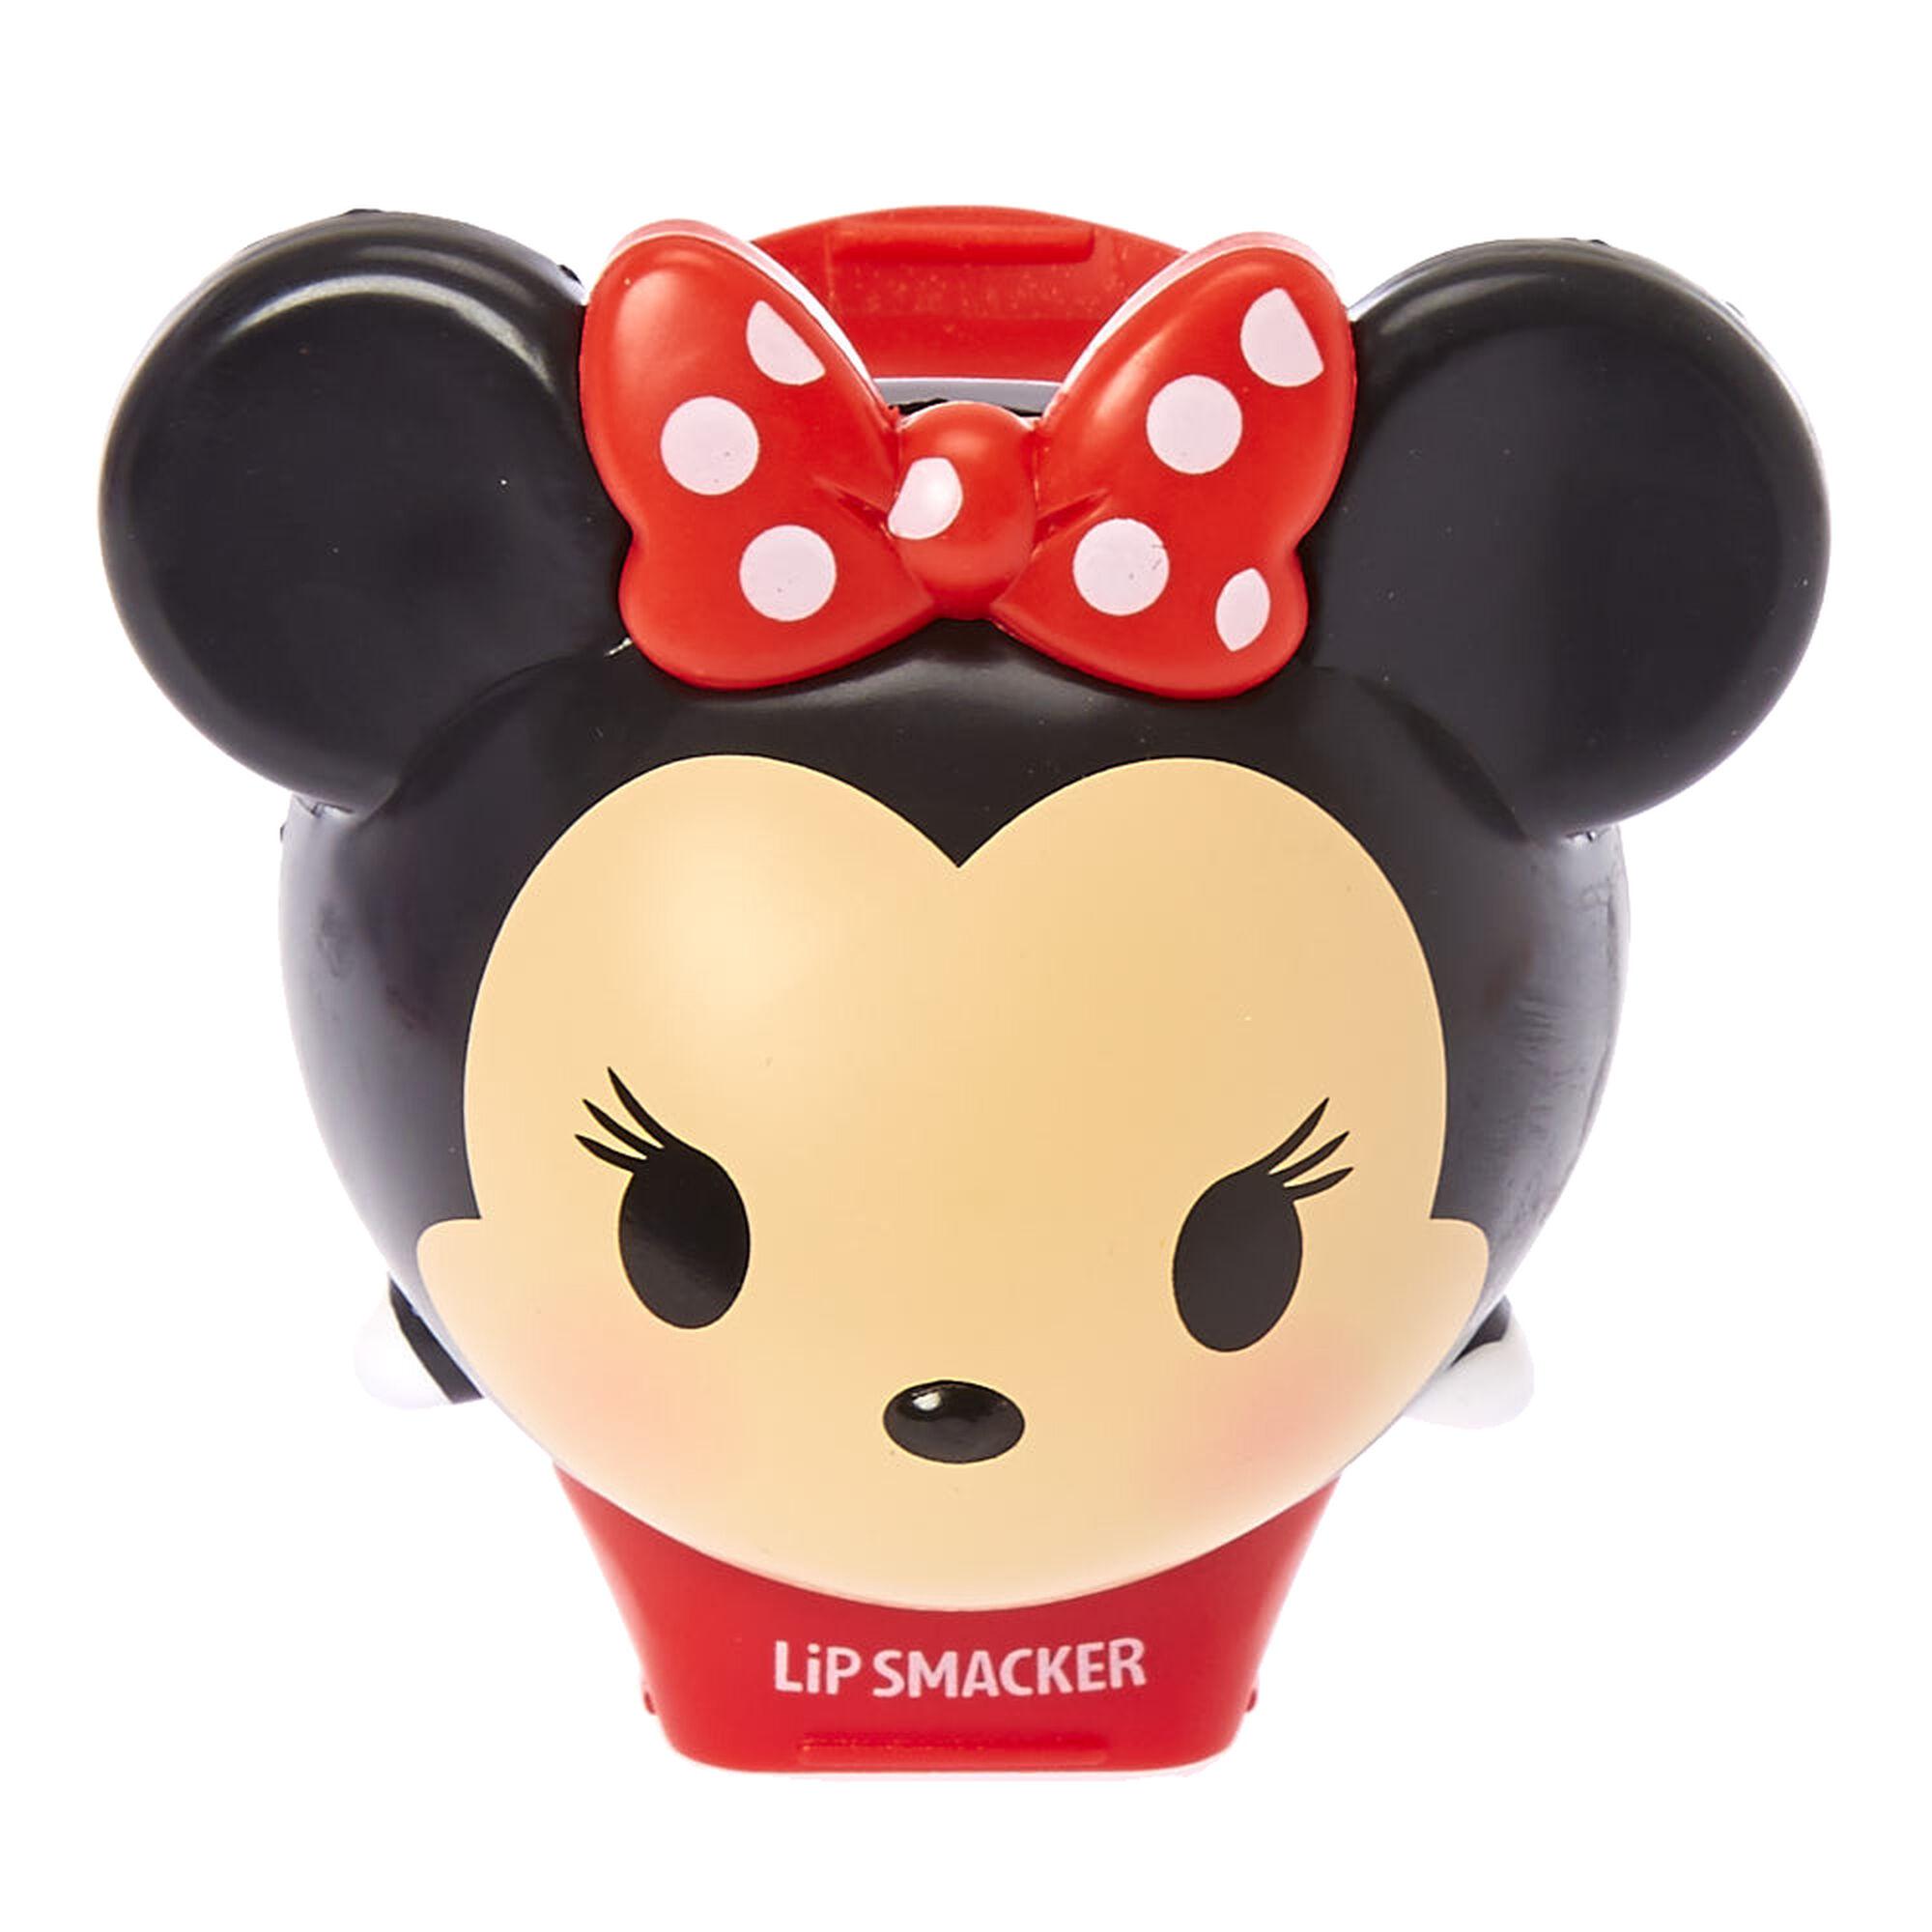 Tsum Tsum Minnie Mouse Stackable Lip Smacker Lip Balm | Claire\'s US